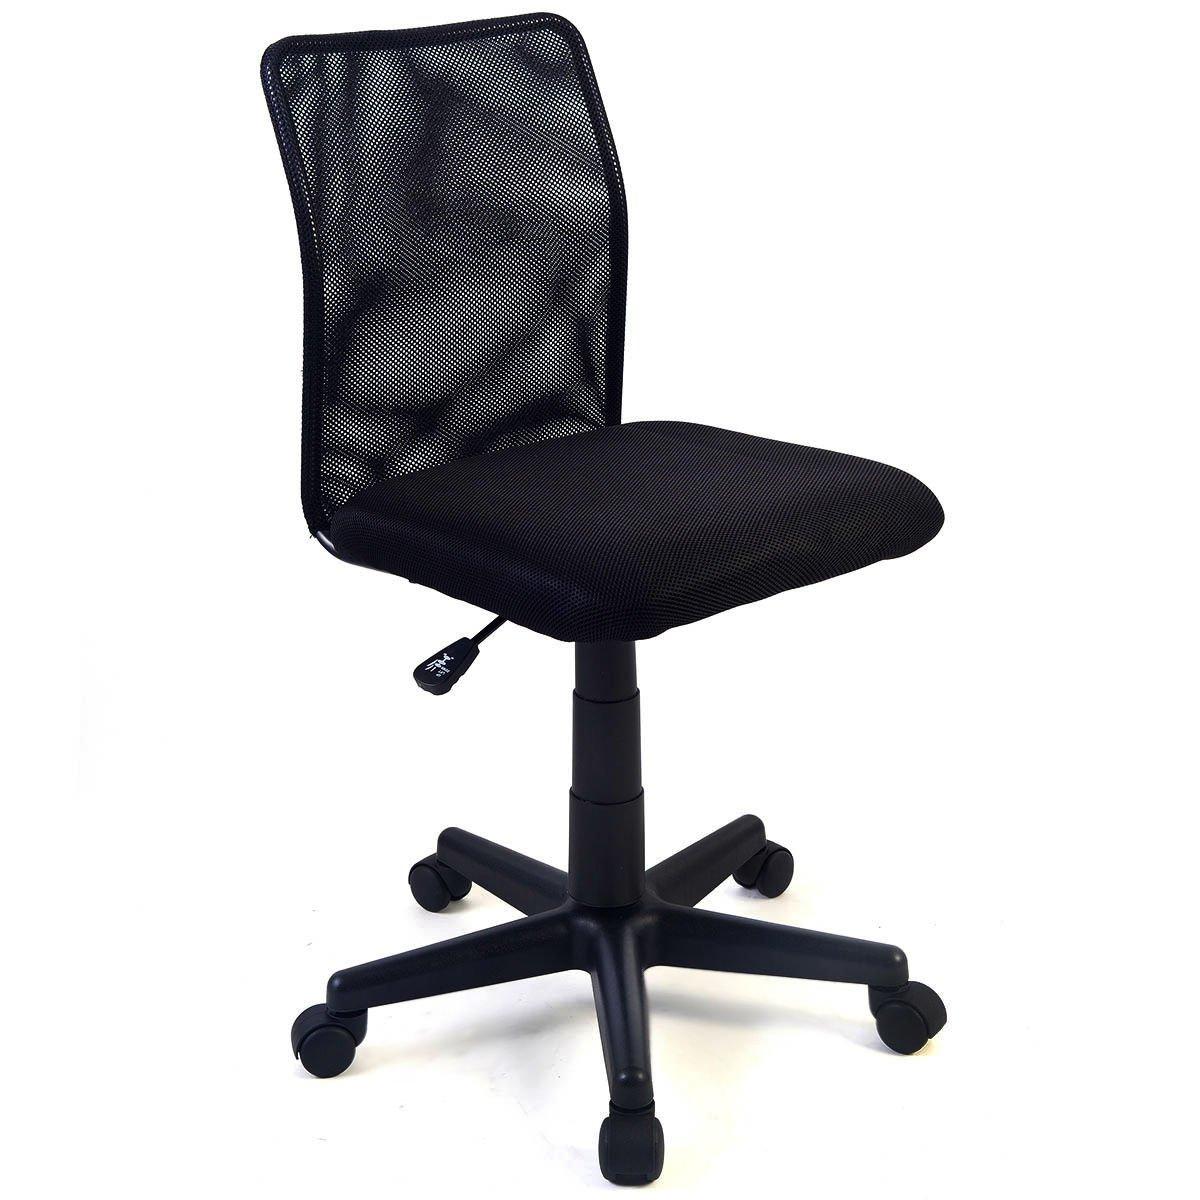 Super buy New Mid-back Adjustable Ergonomic Mesh Swivel Computer Office Desk Task Chair